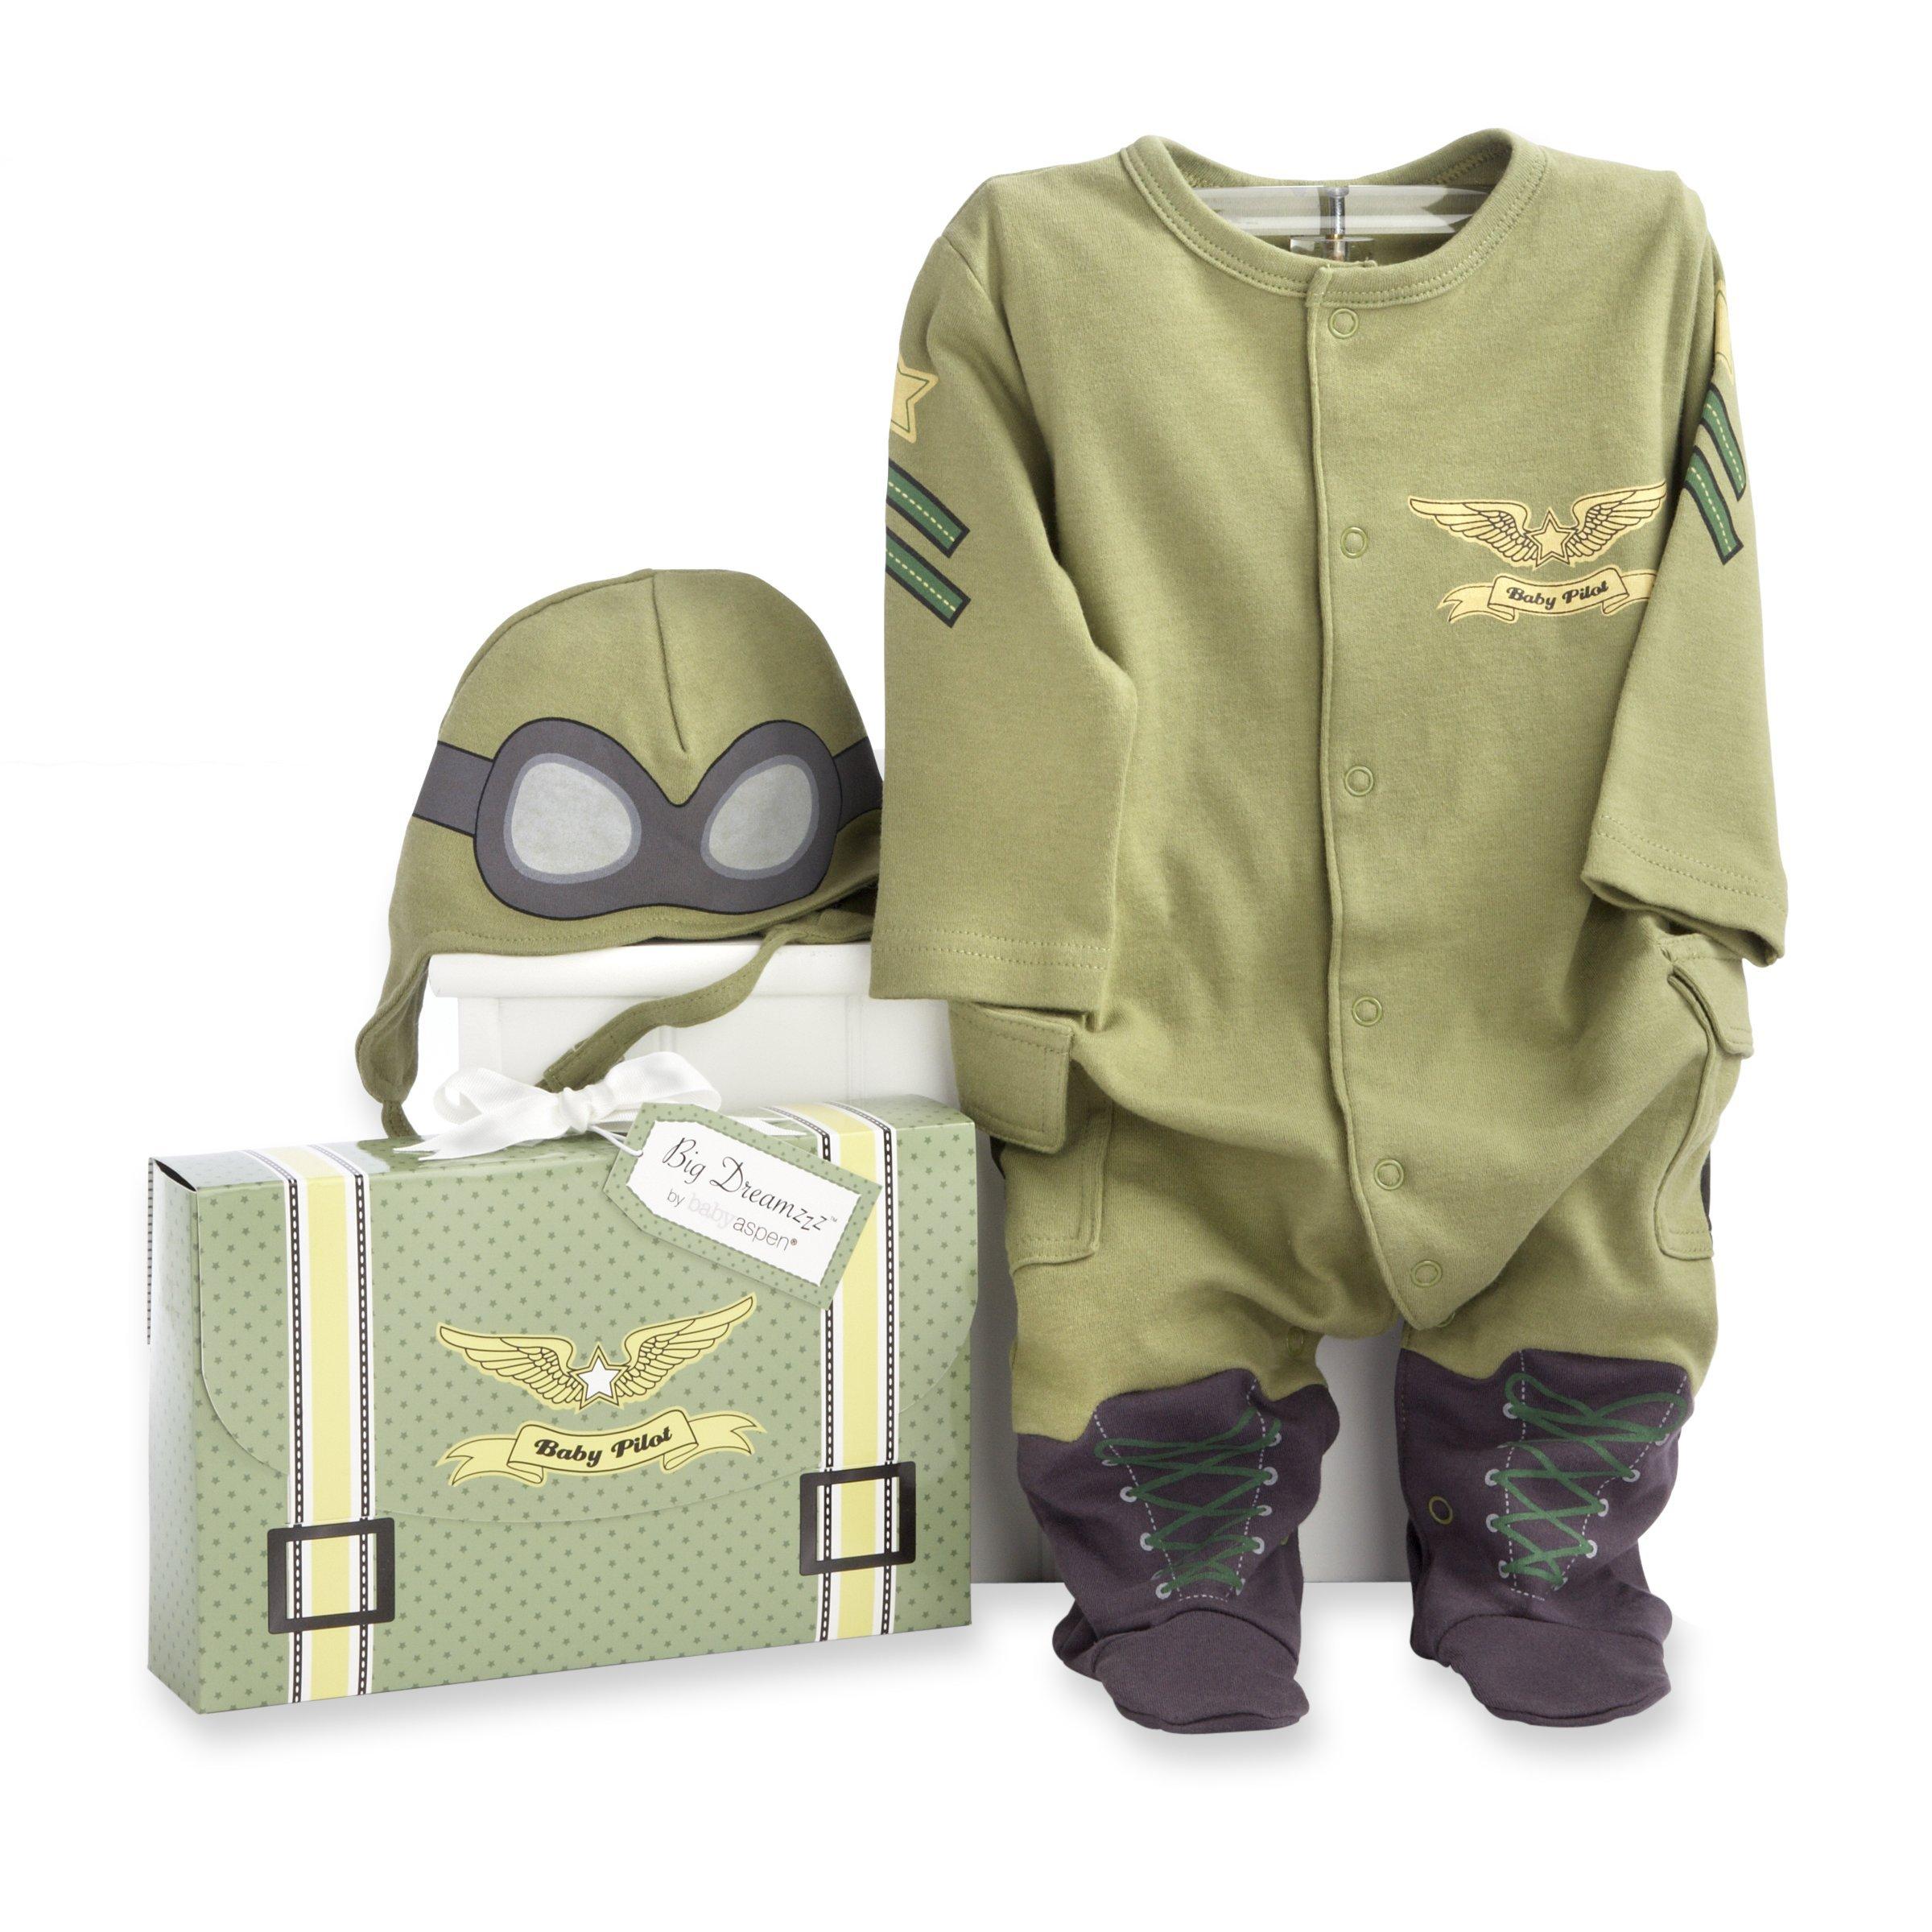 Baby Aspen, Big Dreamzzz Baby Pilot Two-Piece Layette Set, Baby Onesie, Newborn Halloween Costume, Green, 0-6 Months by Baby Aspen